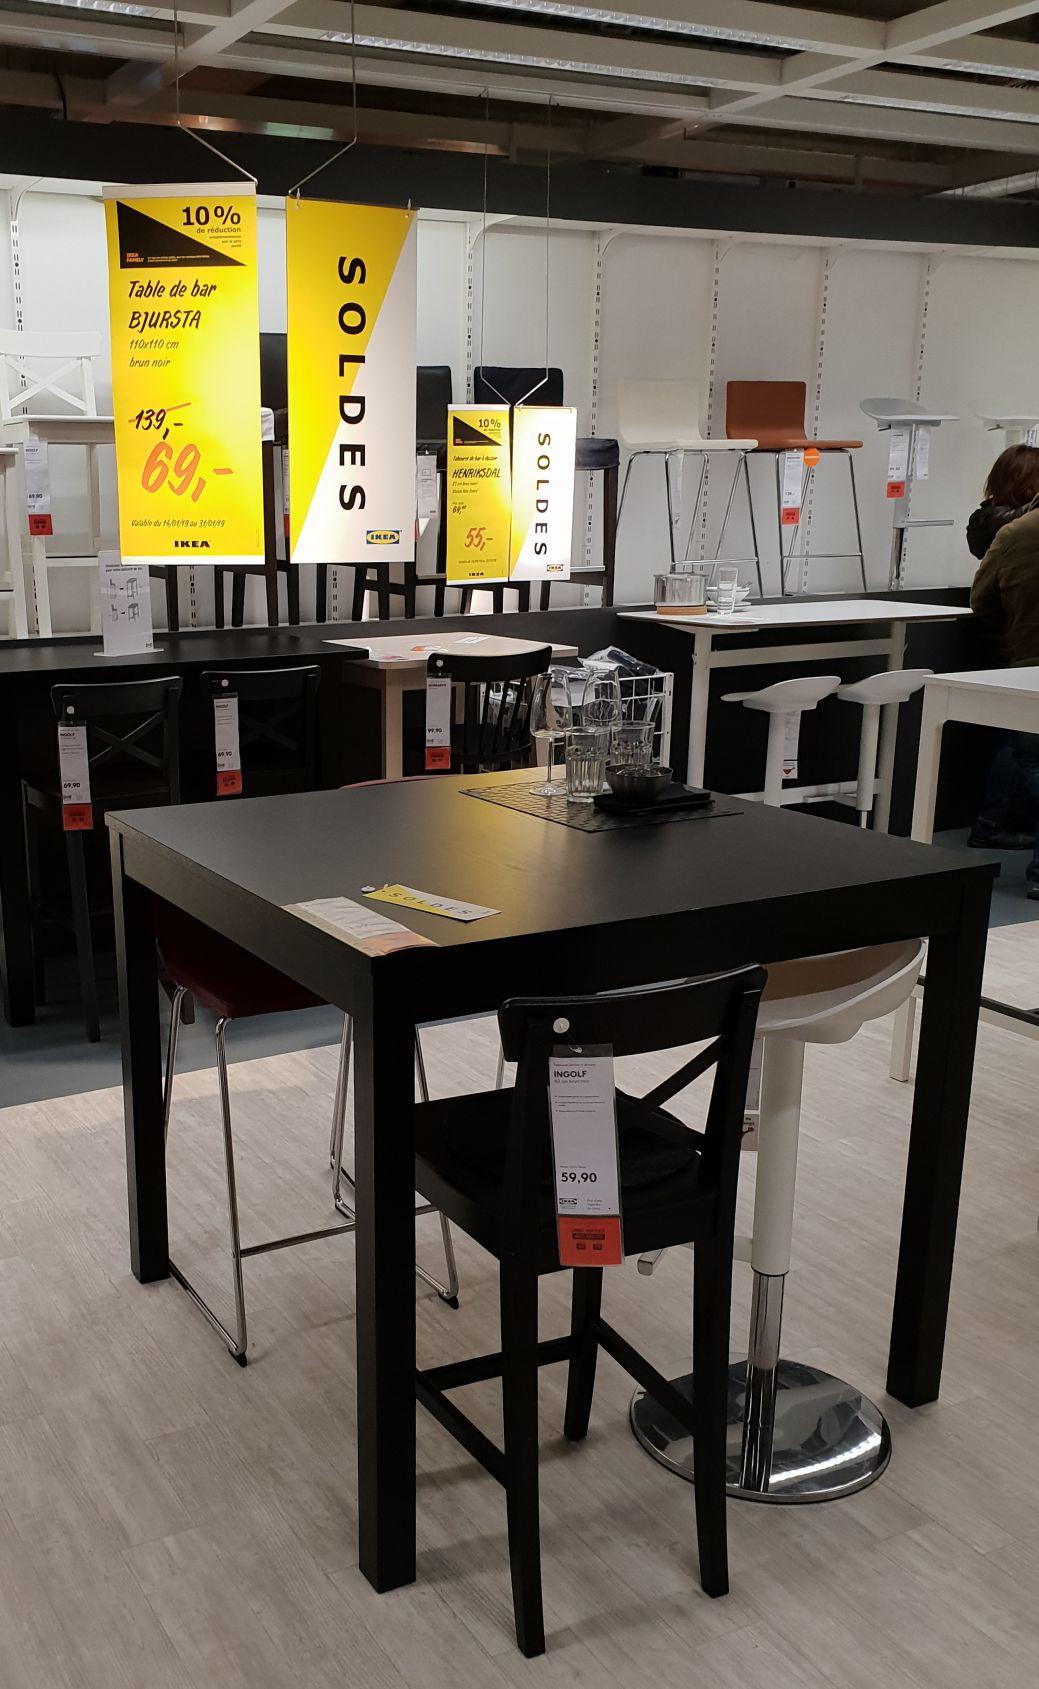 Table de bar Bjursta (Frontaliers Belgique - Arlon)